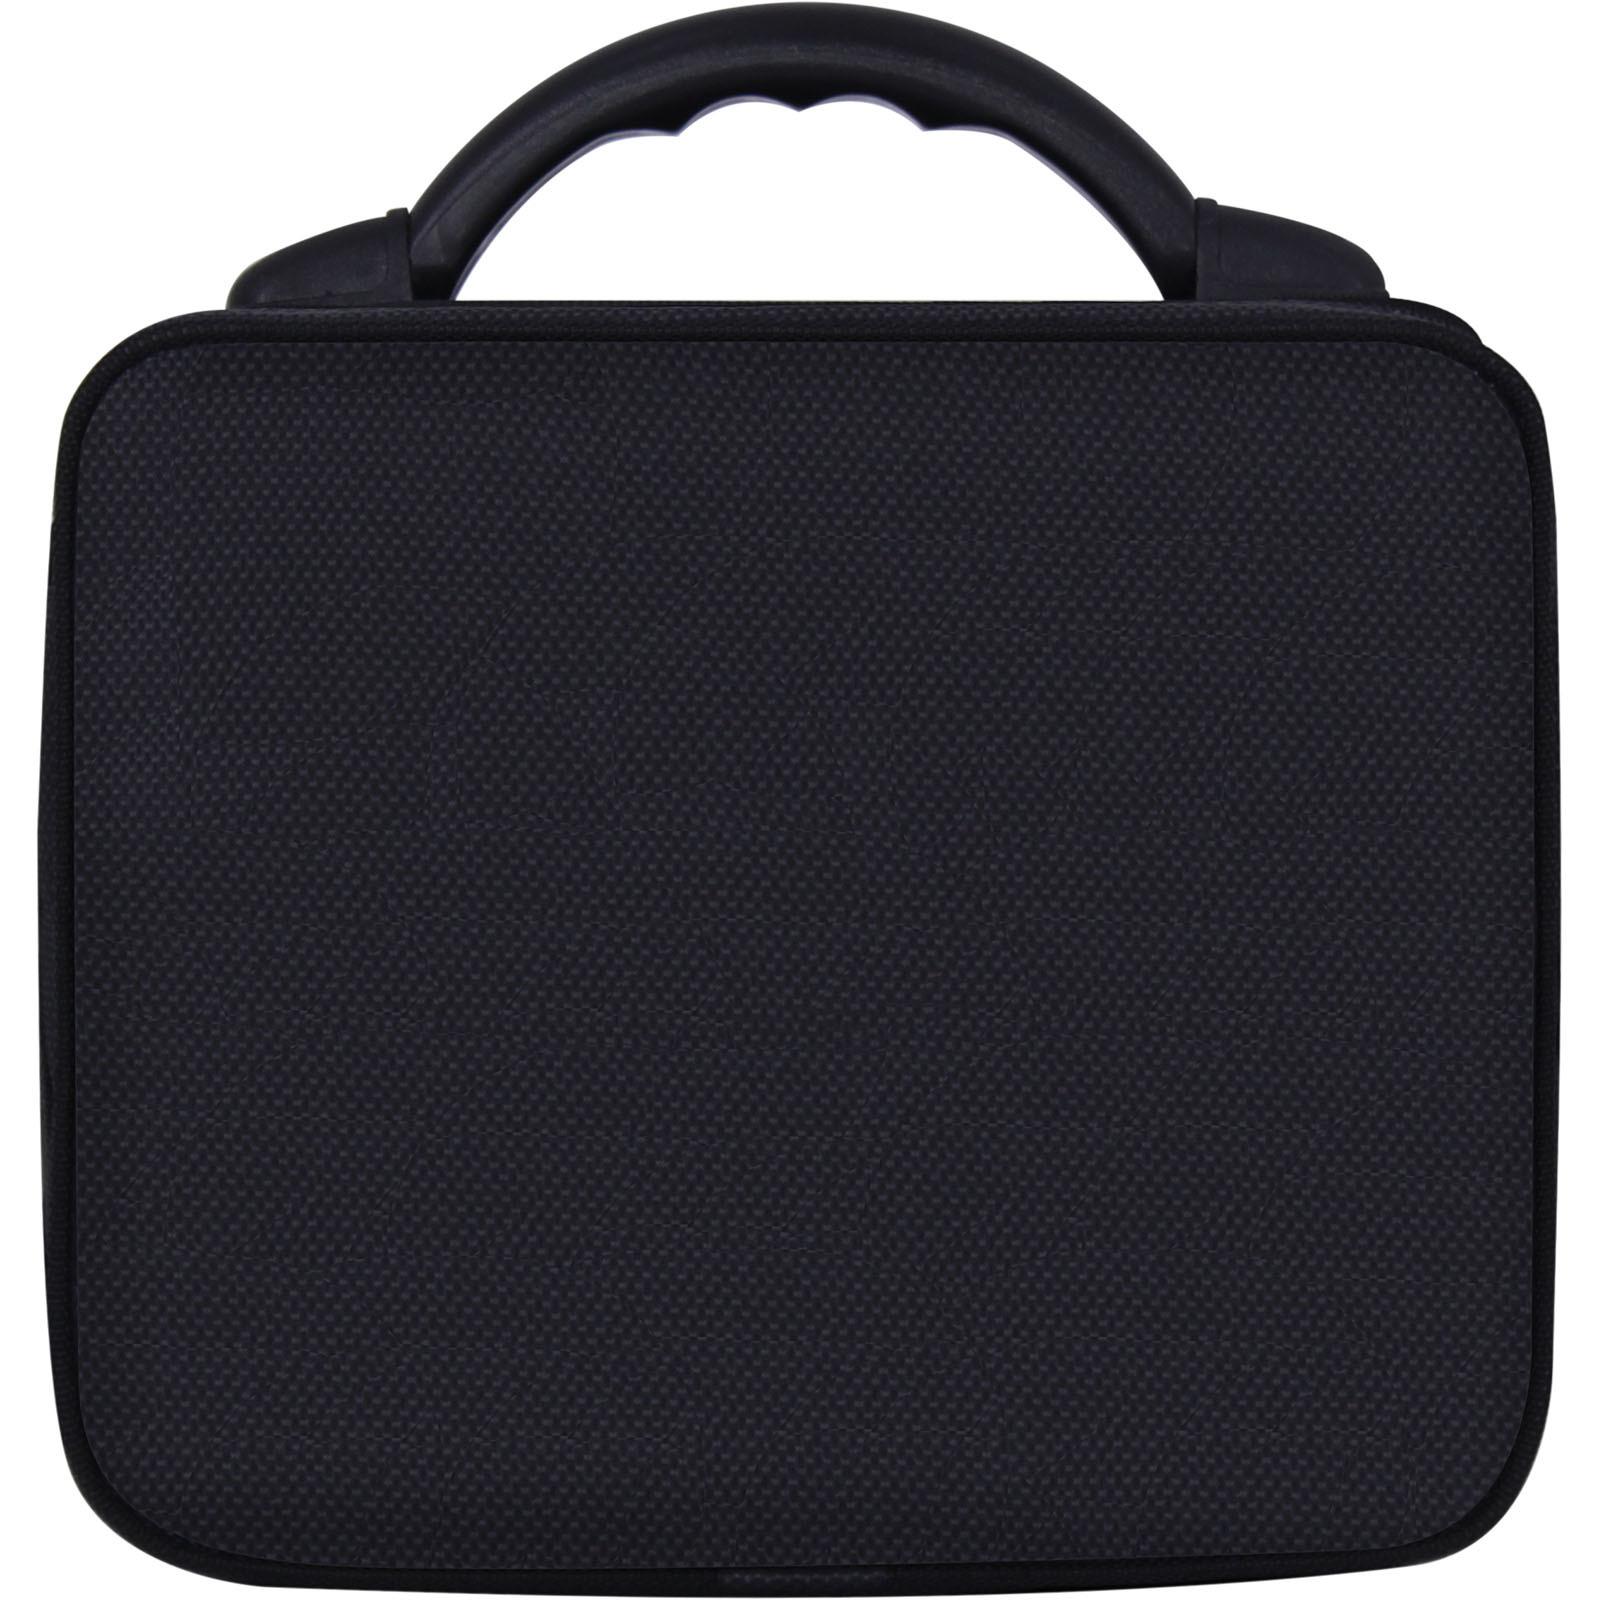 Мужская сумка Bagland Mr.Braun 8 л. Чёрный (00240169) фото 4